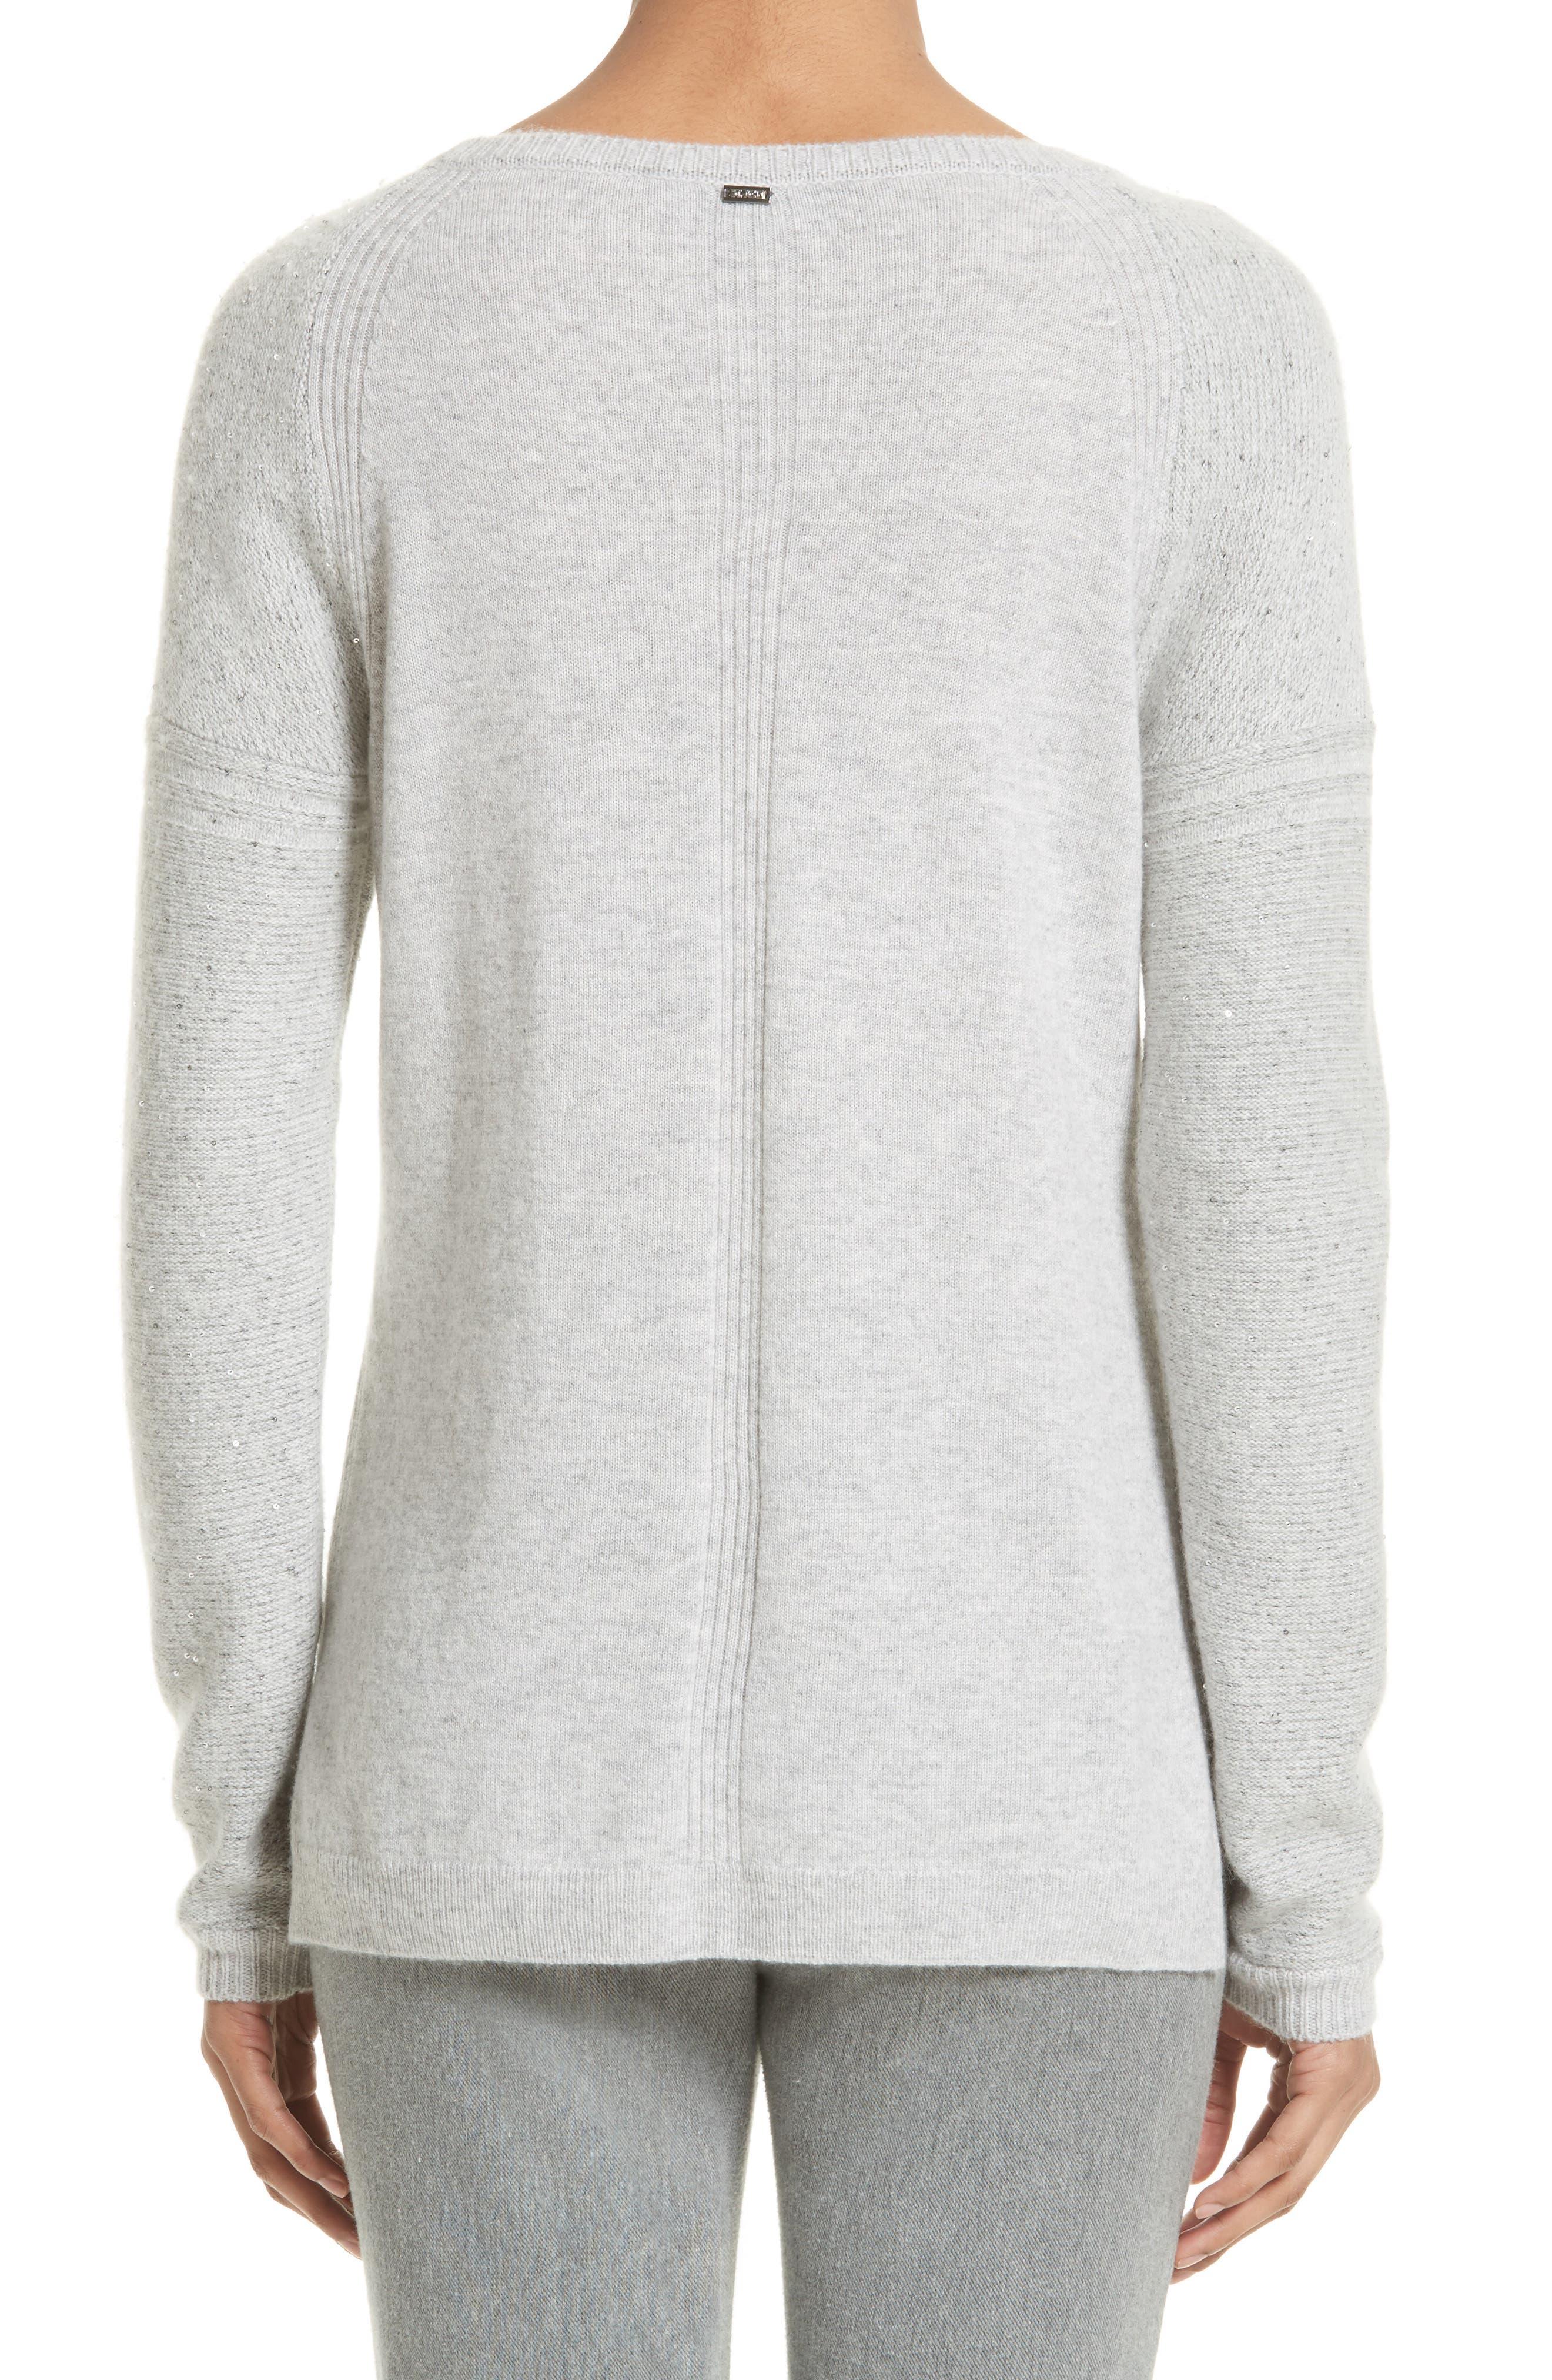 Micro Sequin Stripe Reverse Jersey Cashmere Blend Sweater,                             Alternate thumbnail 2, color,                             Light Grey Melange